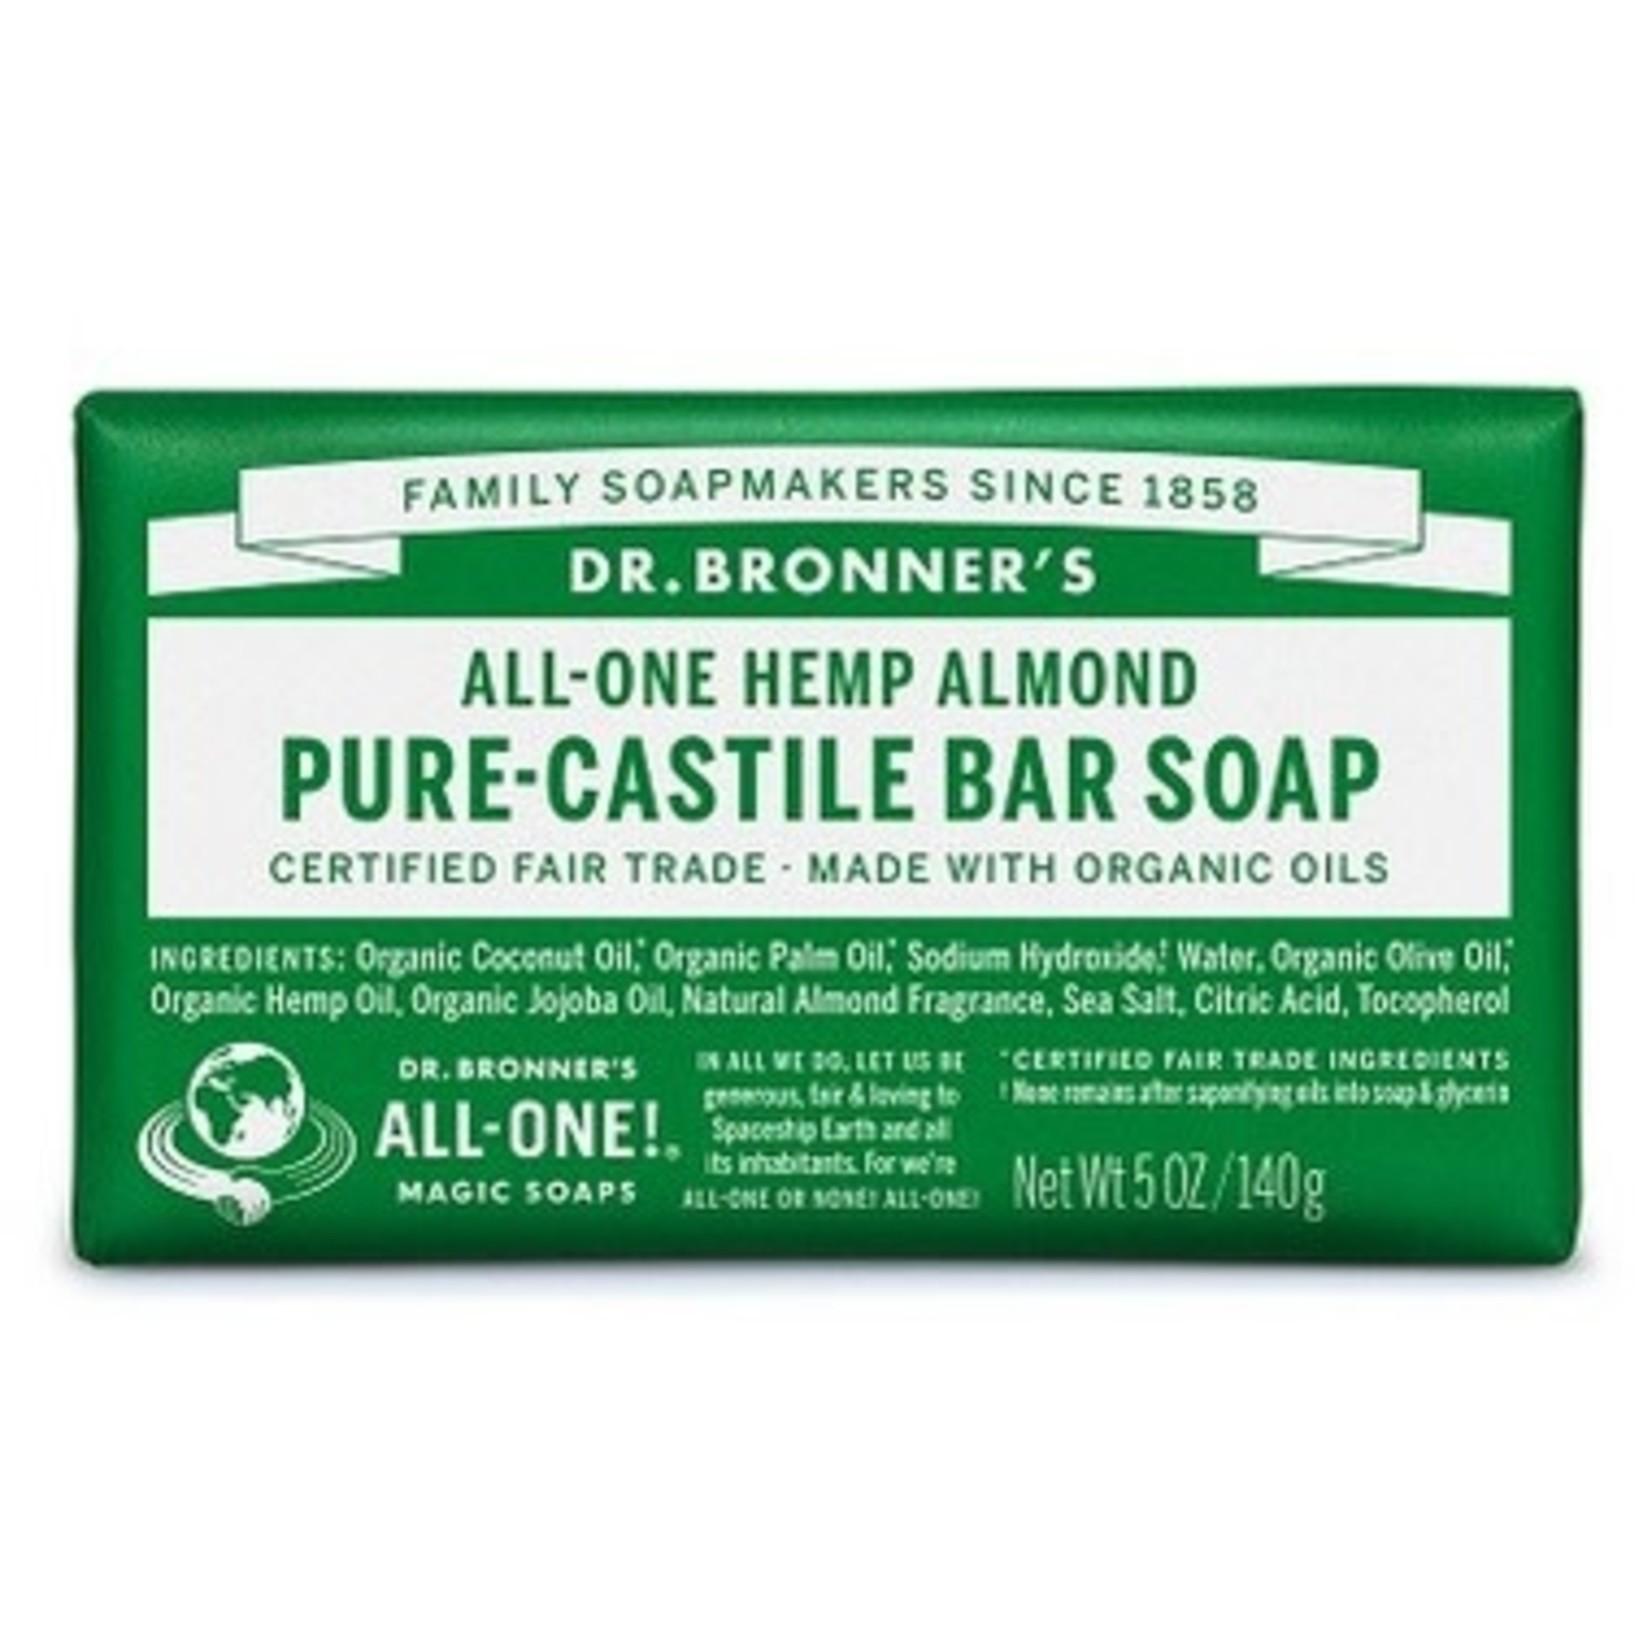 DR. BRONNER'S PURE CASTILE SOAP - ALMOND